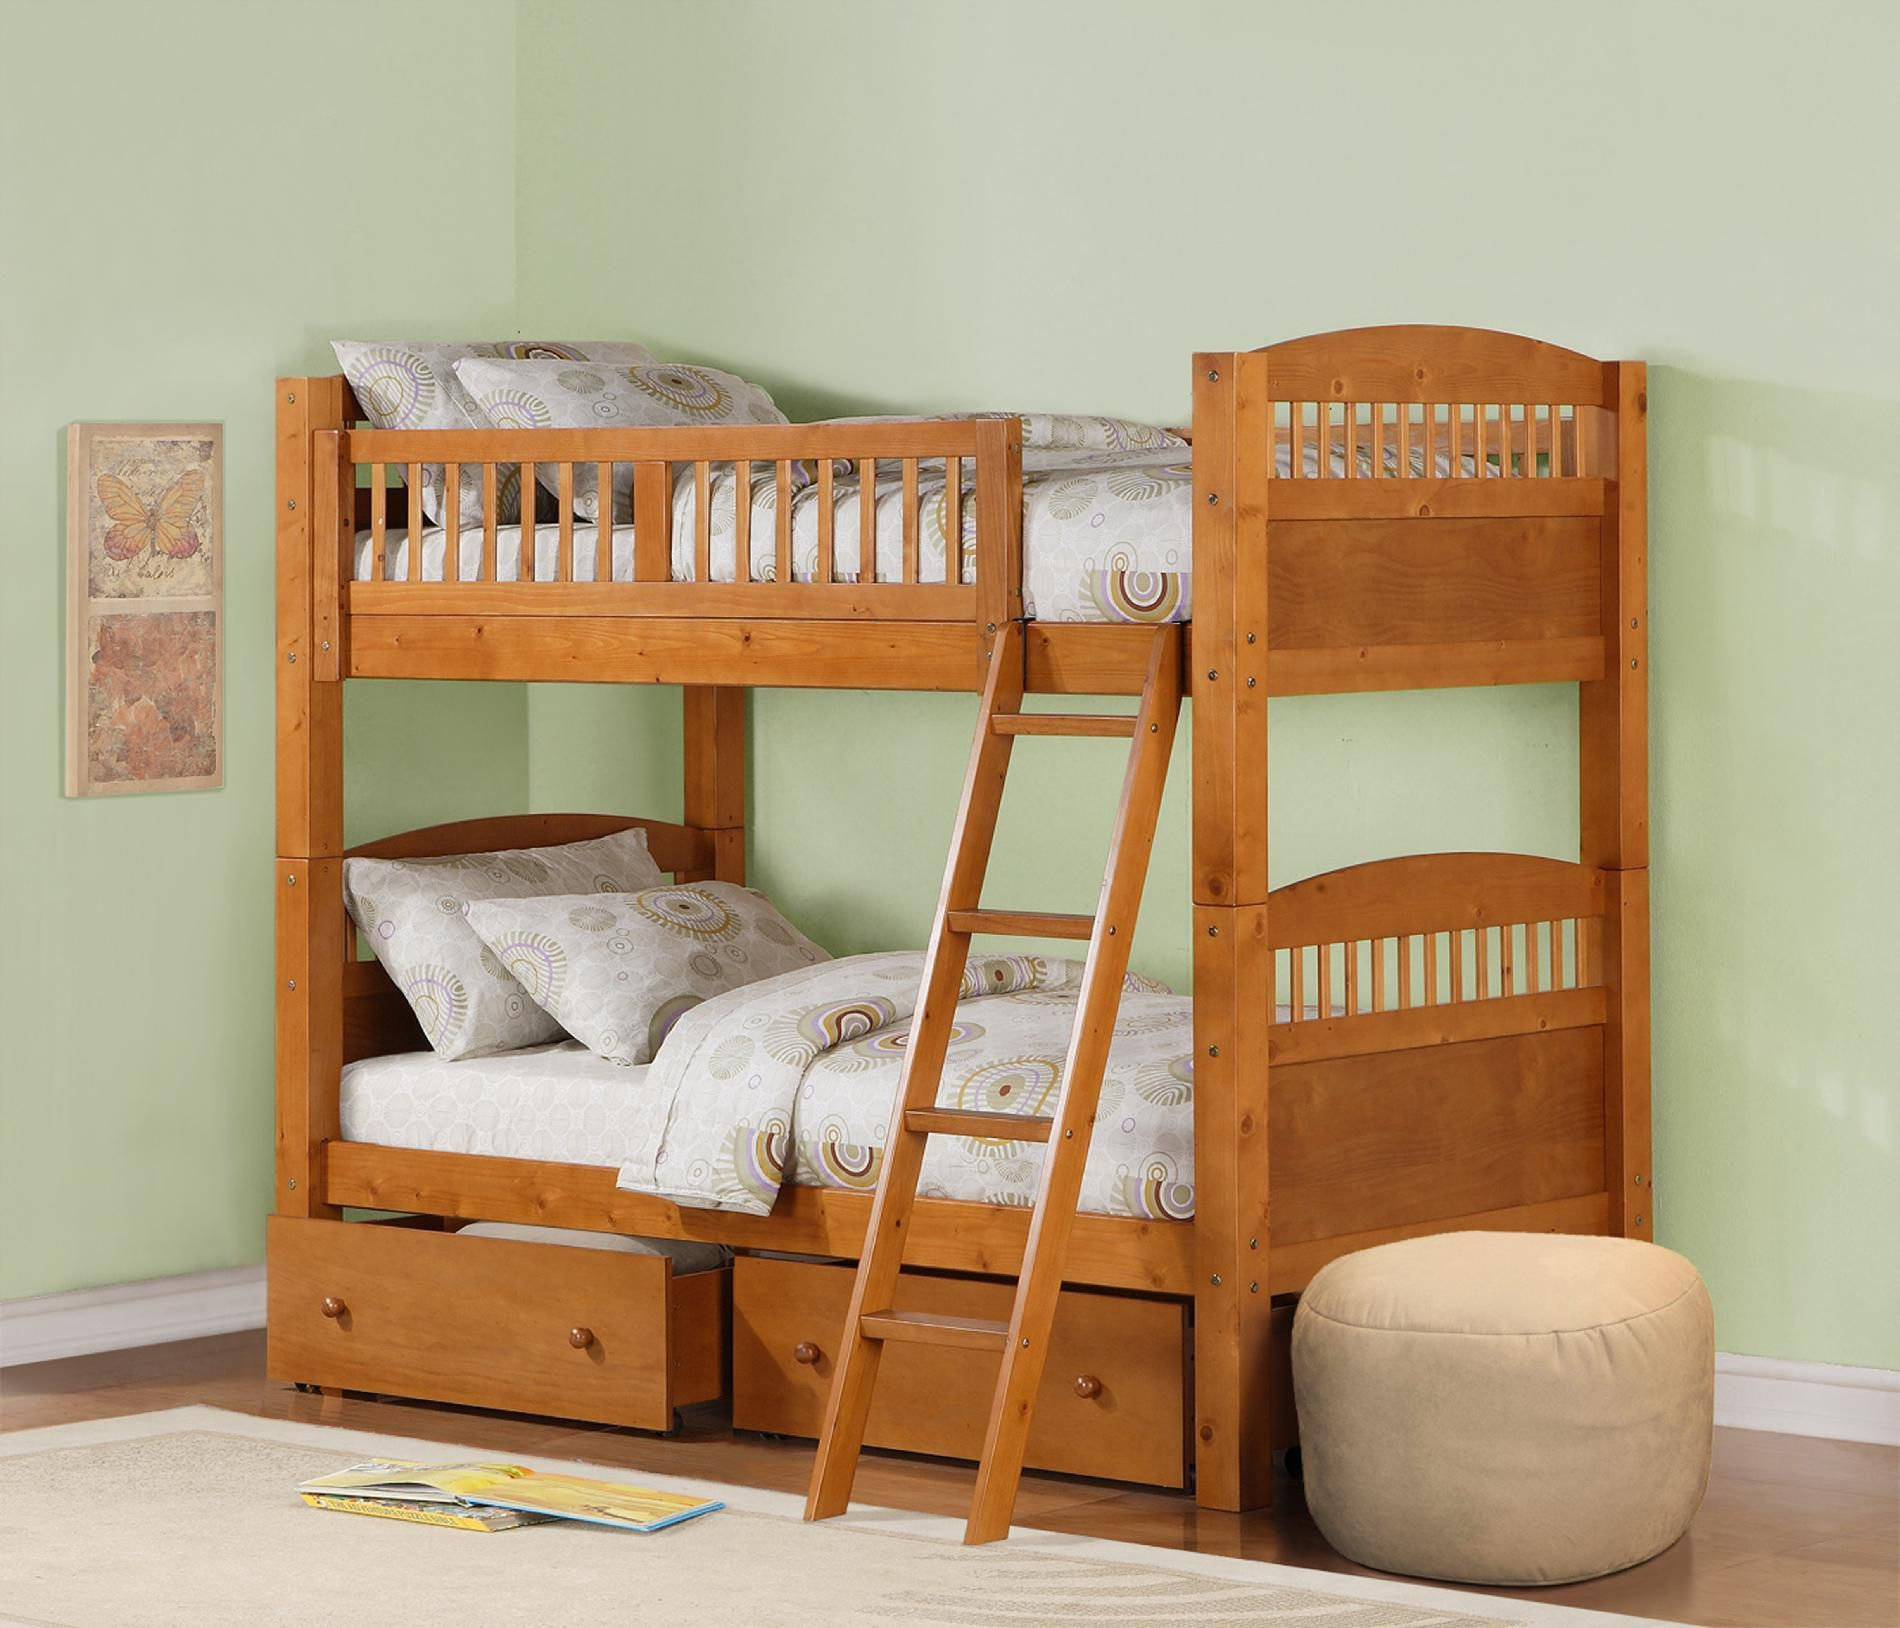 Pine Bunk Bed Sleep Well With Sears Kid Bedroom Ideas